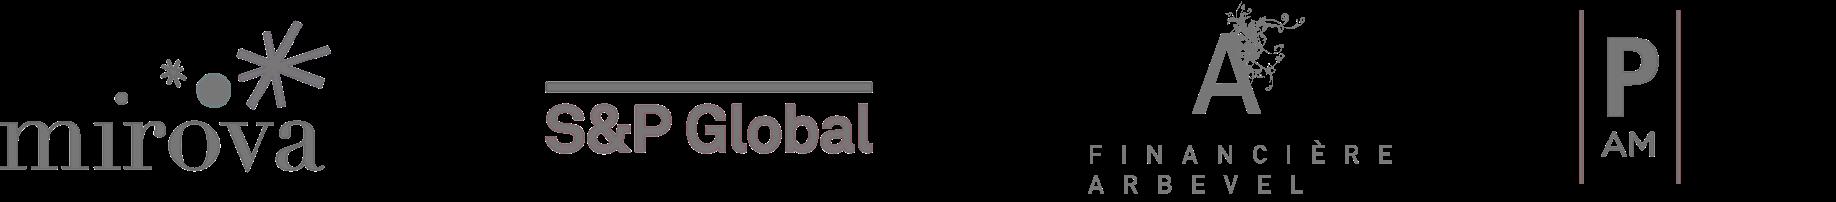 Mirova, S&P global, Financière Arbevel, Pleiade logos